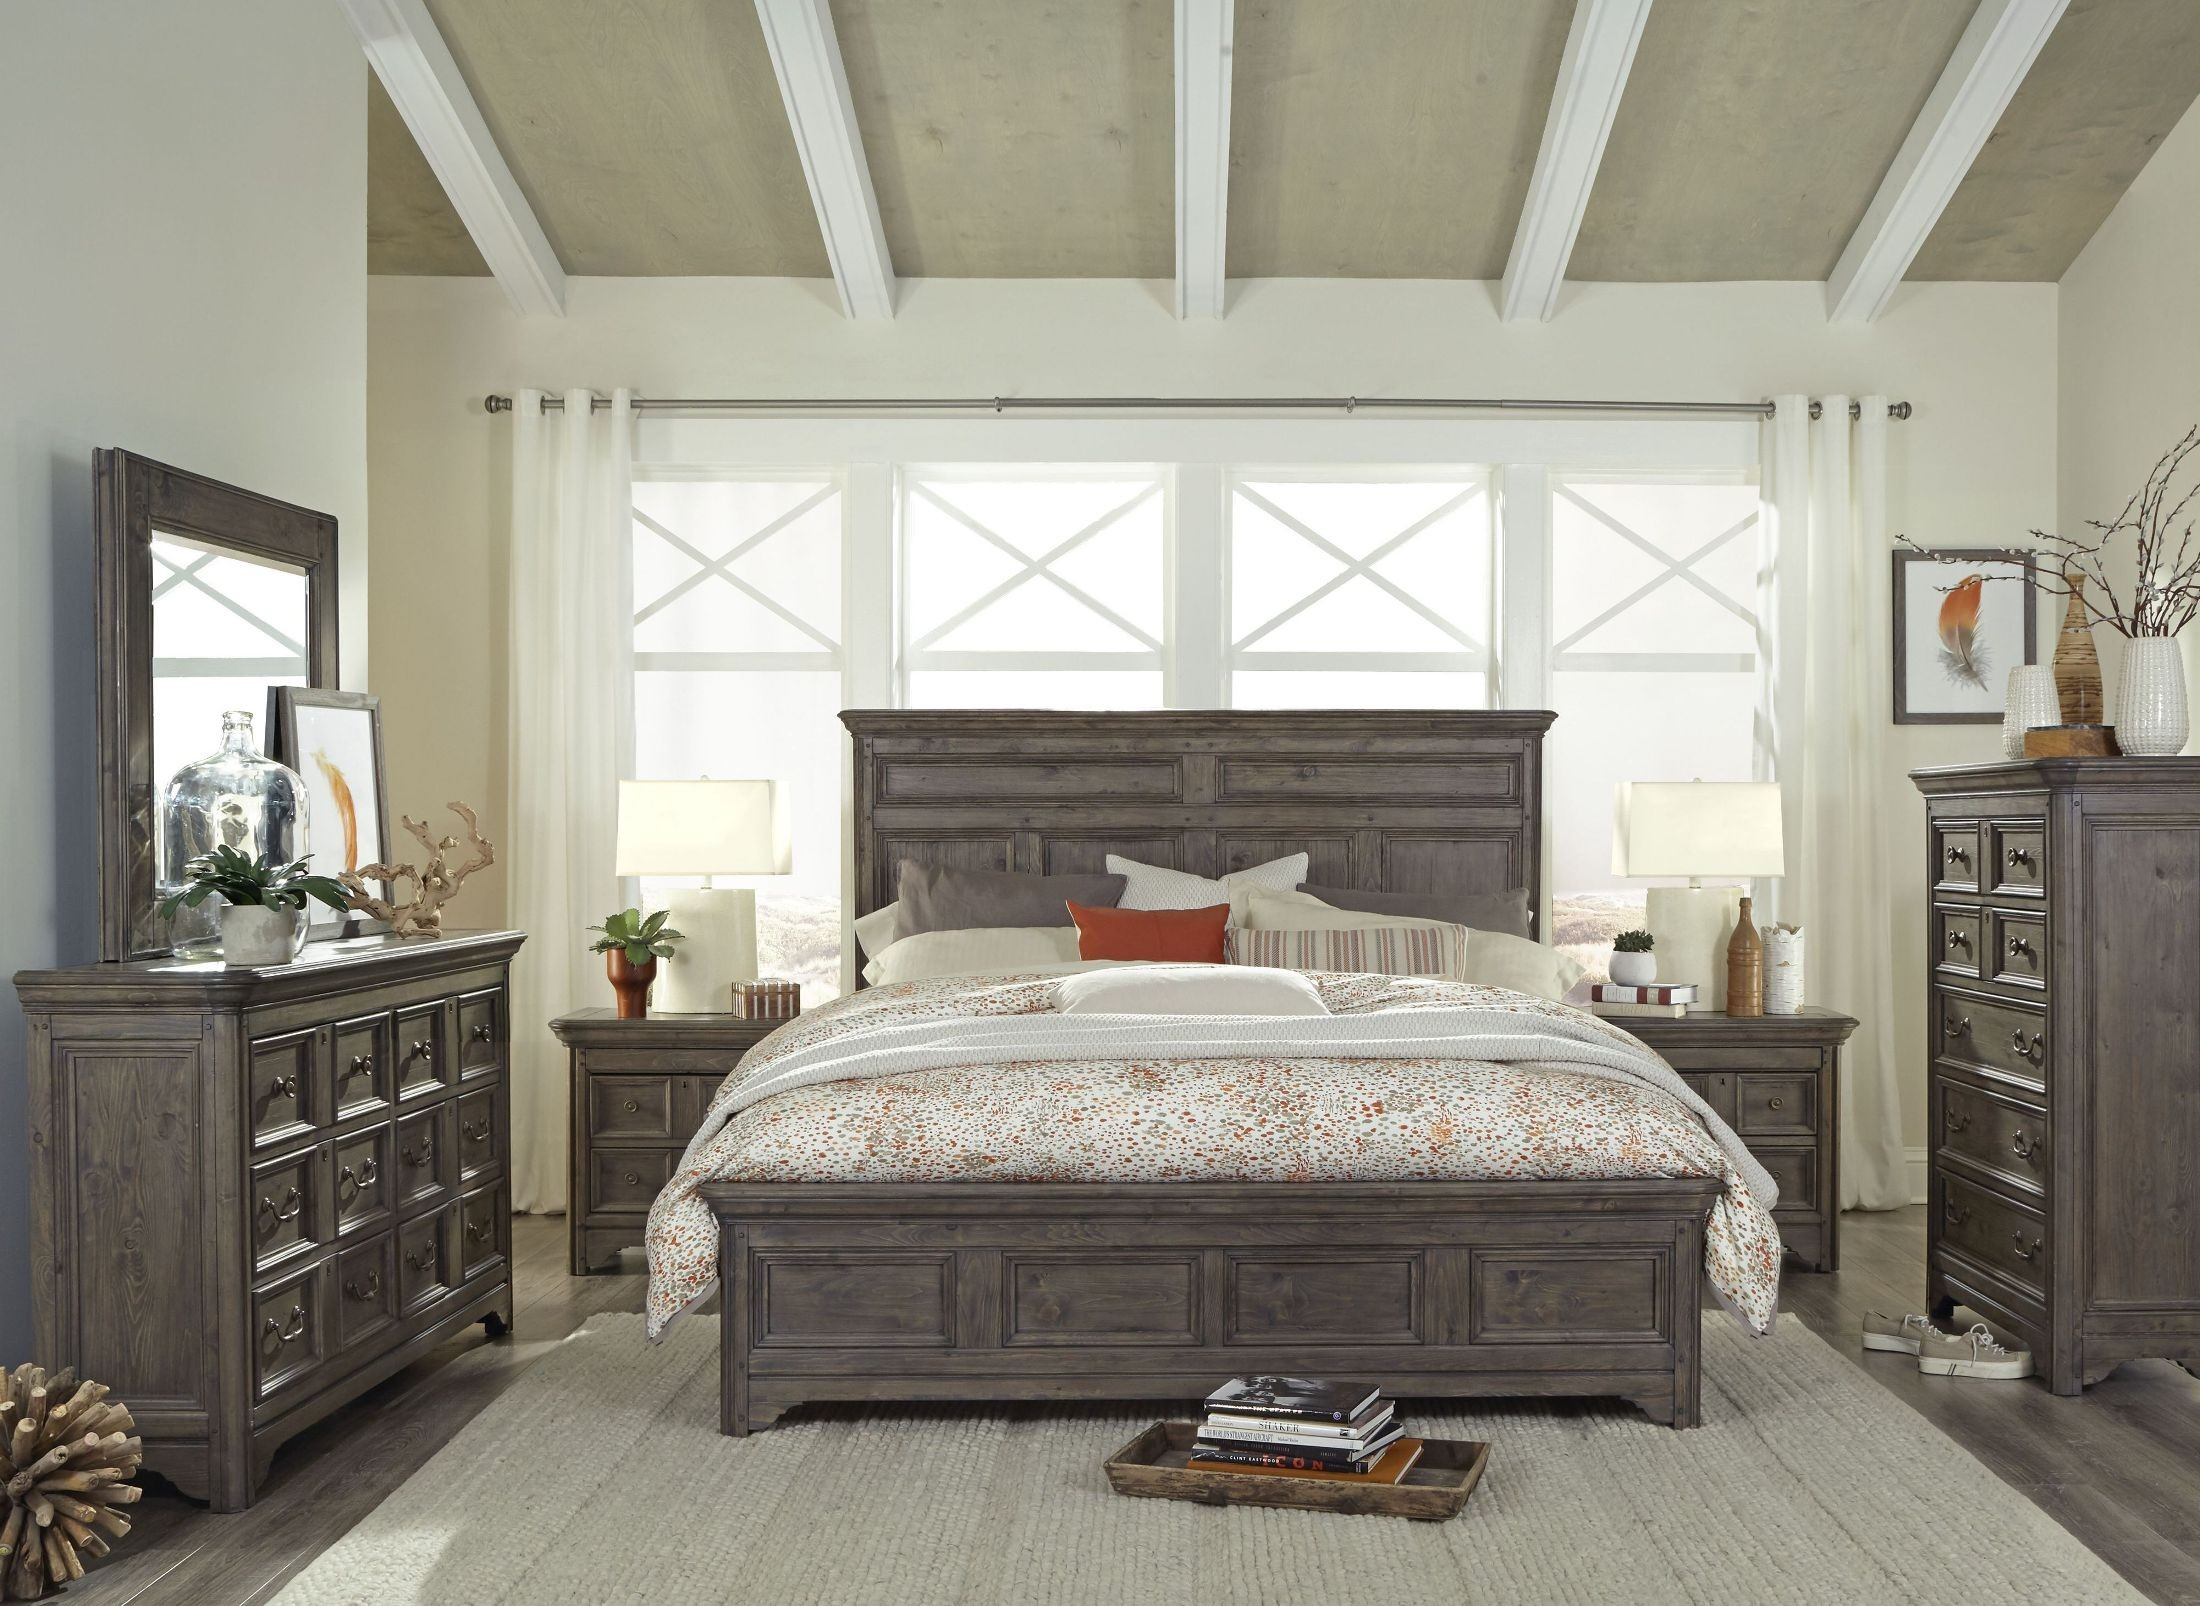 Shelter Cove Driftwood Panel Bedroom Set from Magnussen Home  Coleman Furniture